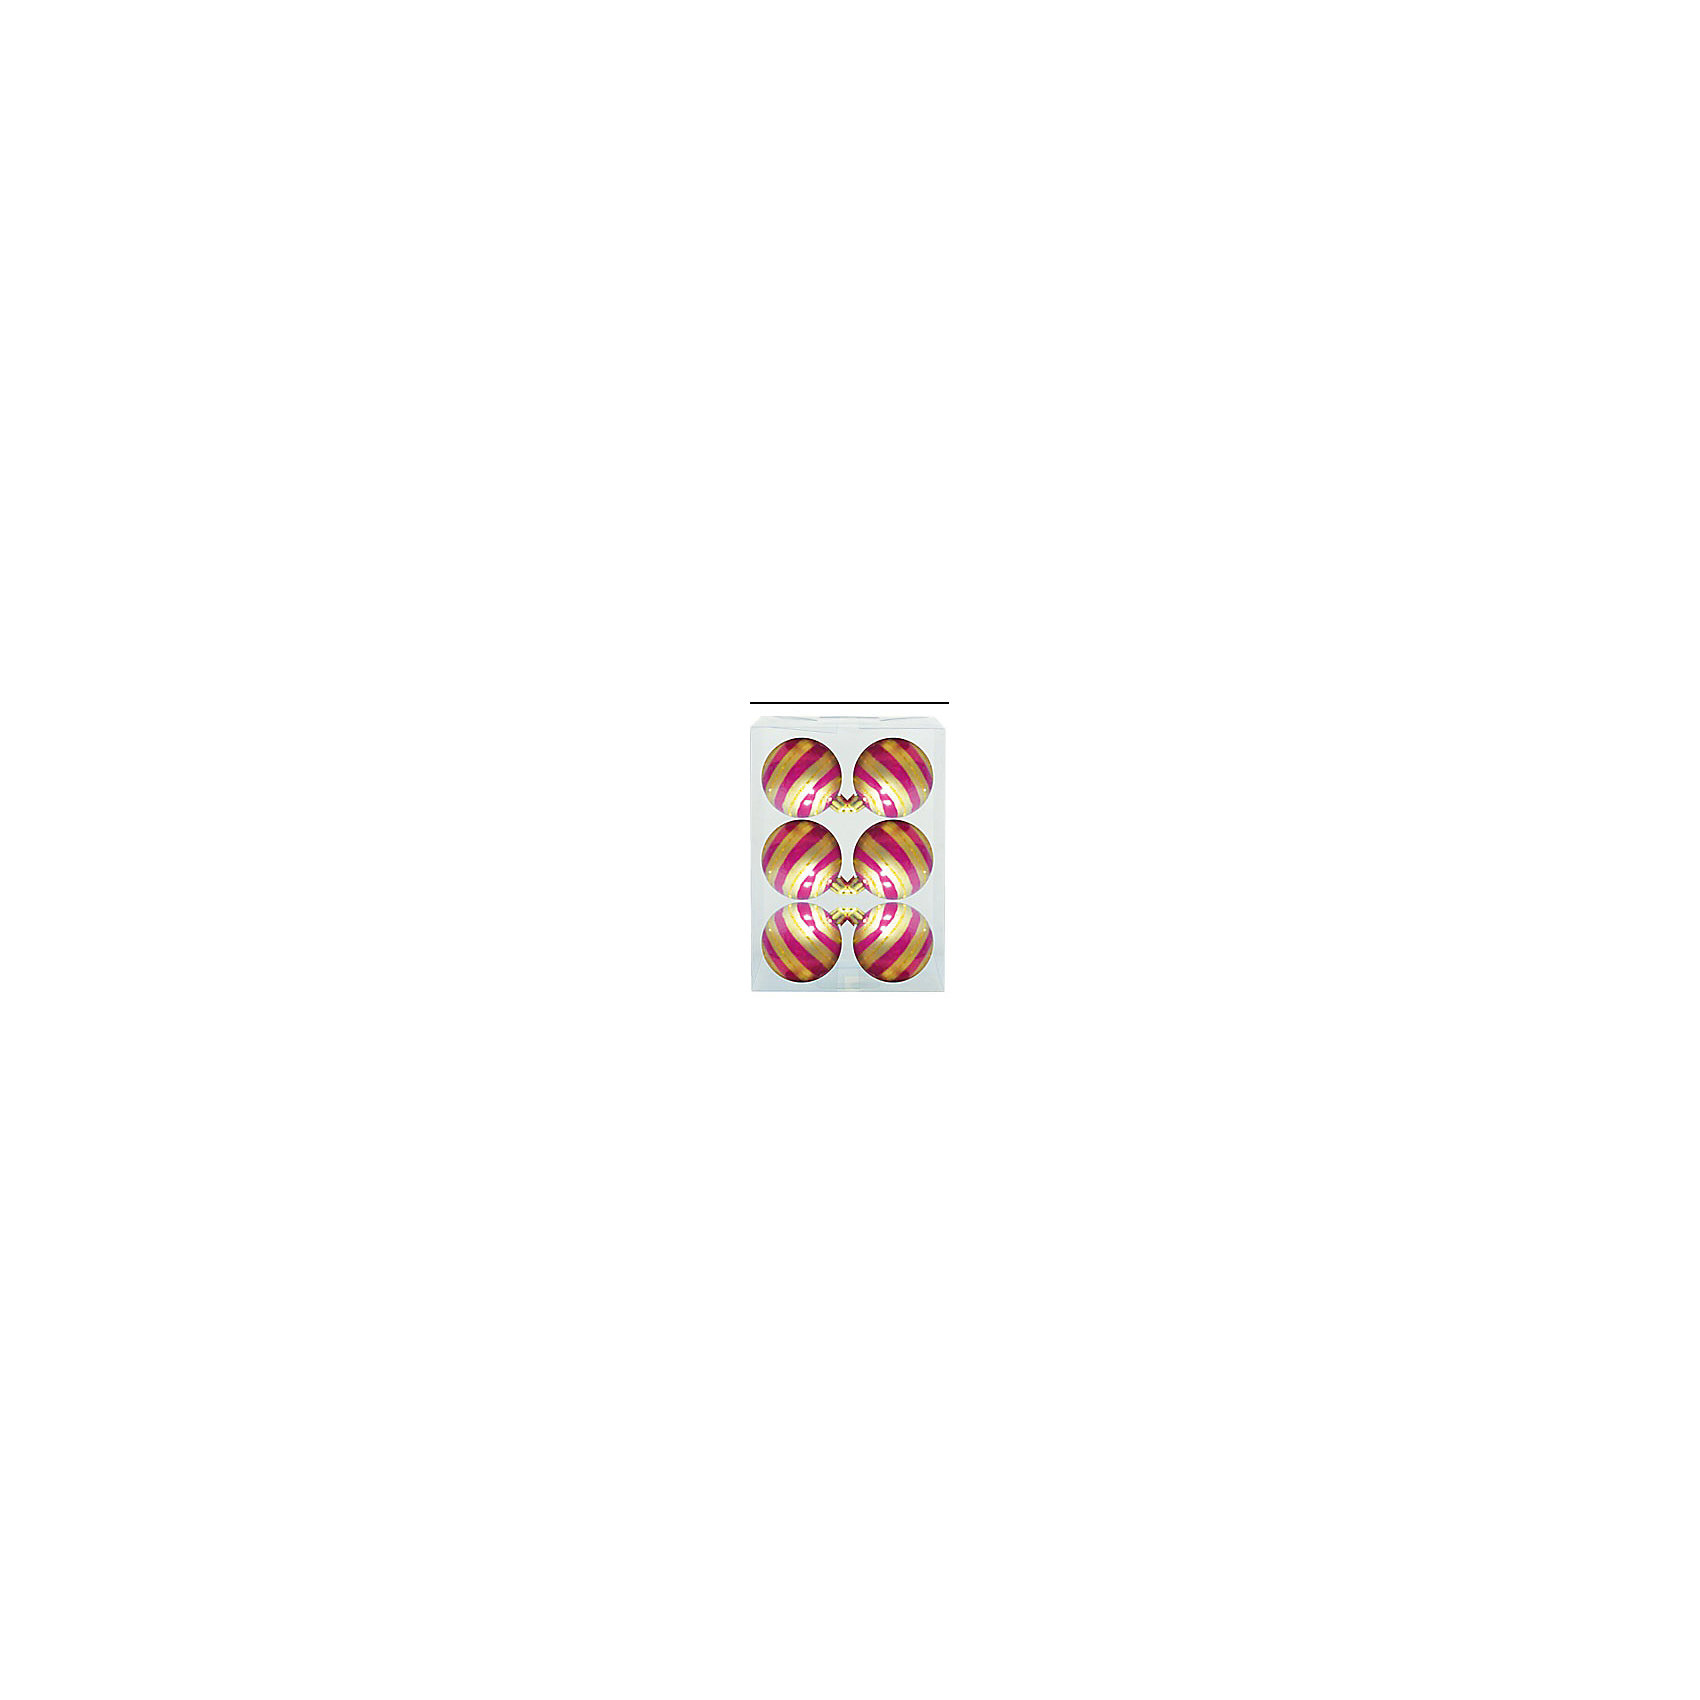 Набор шаров Детский 6 шт, 6 см, розовый глянцевый с узоромнабор шаров ДЕТСКИЙ 6 шт, 6 см, розов глянц с узором  золот полоса<br><br>Ширина мм: 200<br>Глубина мм: 200<br>Высота мм: 10<br>Вес г: 100<br>Возраст от месяцев: 36<br>Возраст до месяцев: 2147483647<br>Пол: Унисекс<br>Возраст: Детский<br>SKU: 5101043